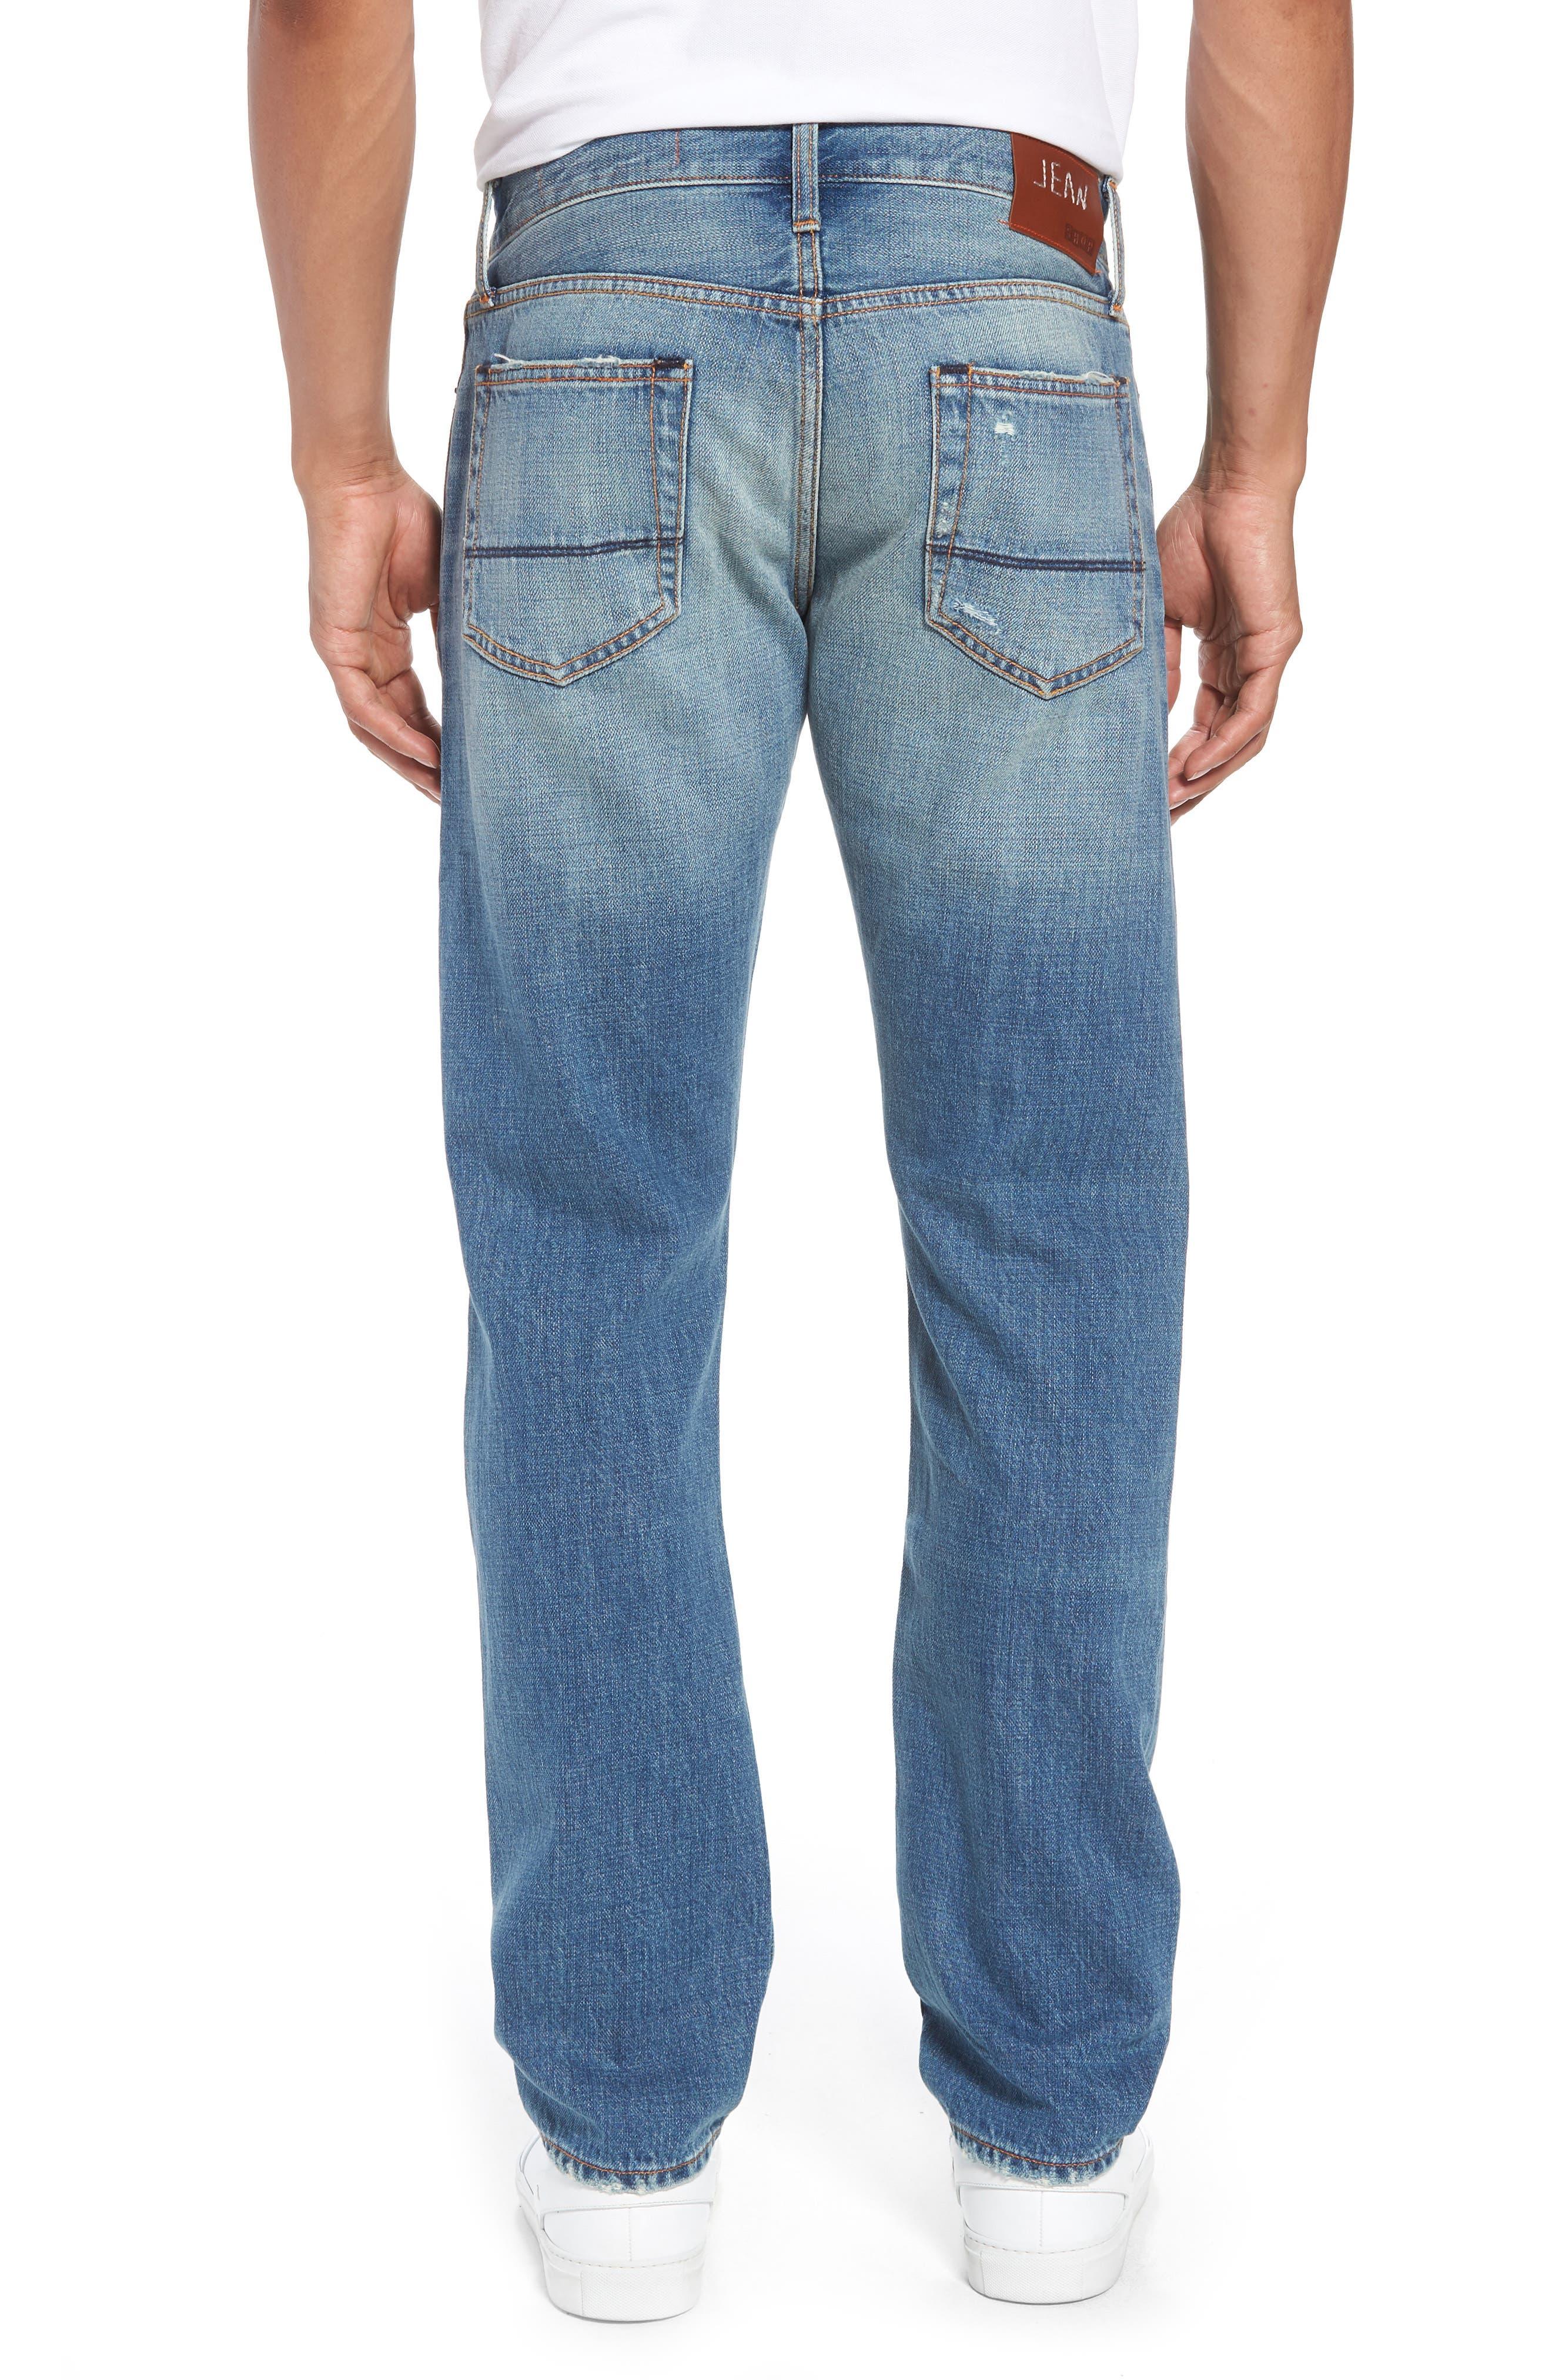 Mick Slim Straight Leg Jeans,                             Alternate thumbnail 2, color,                             400